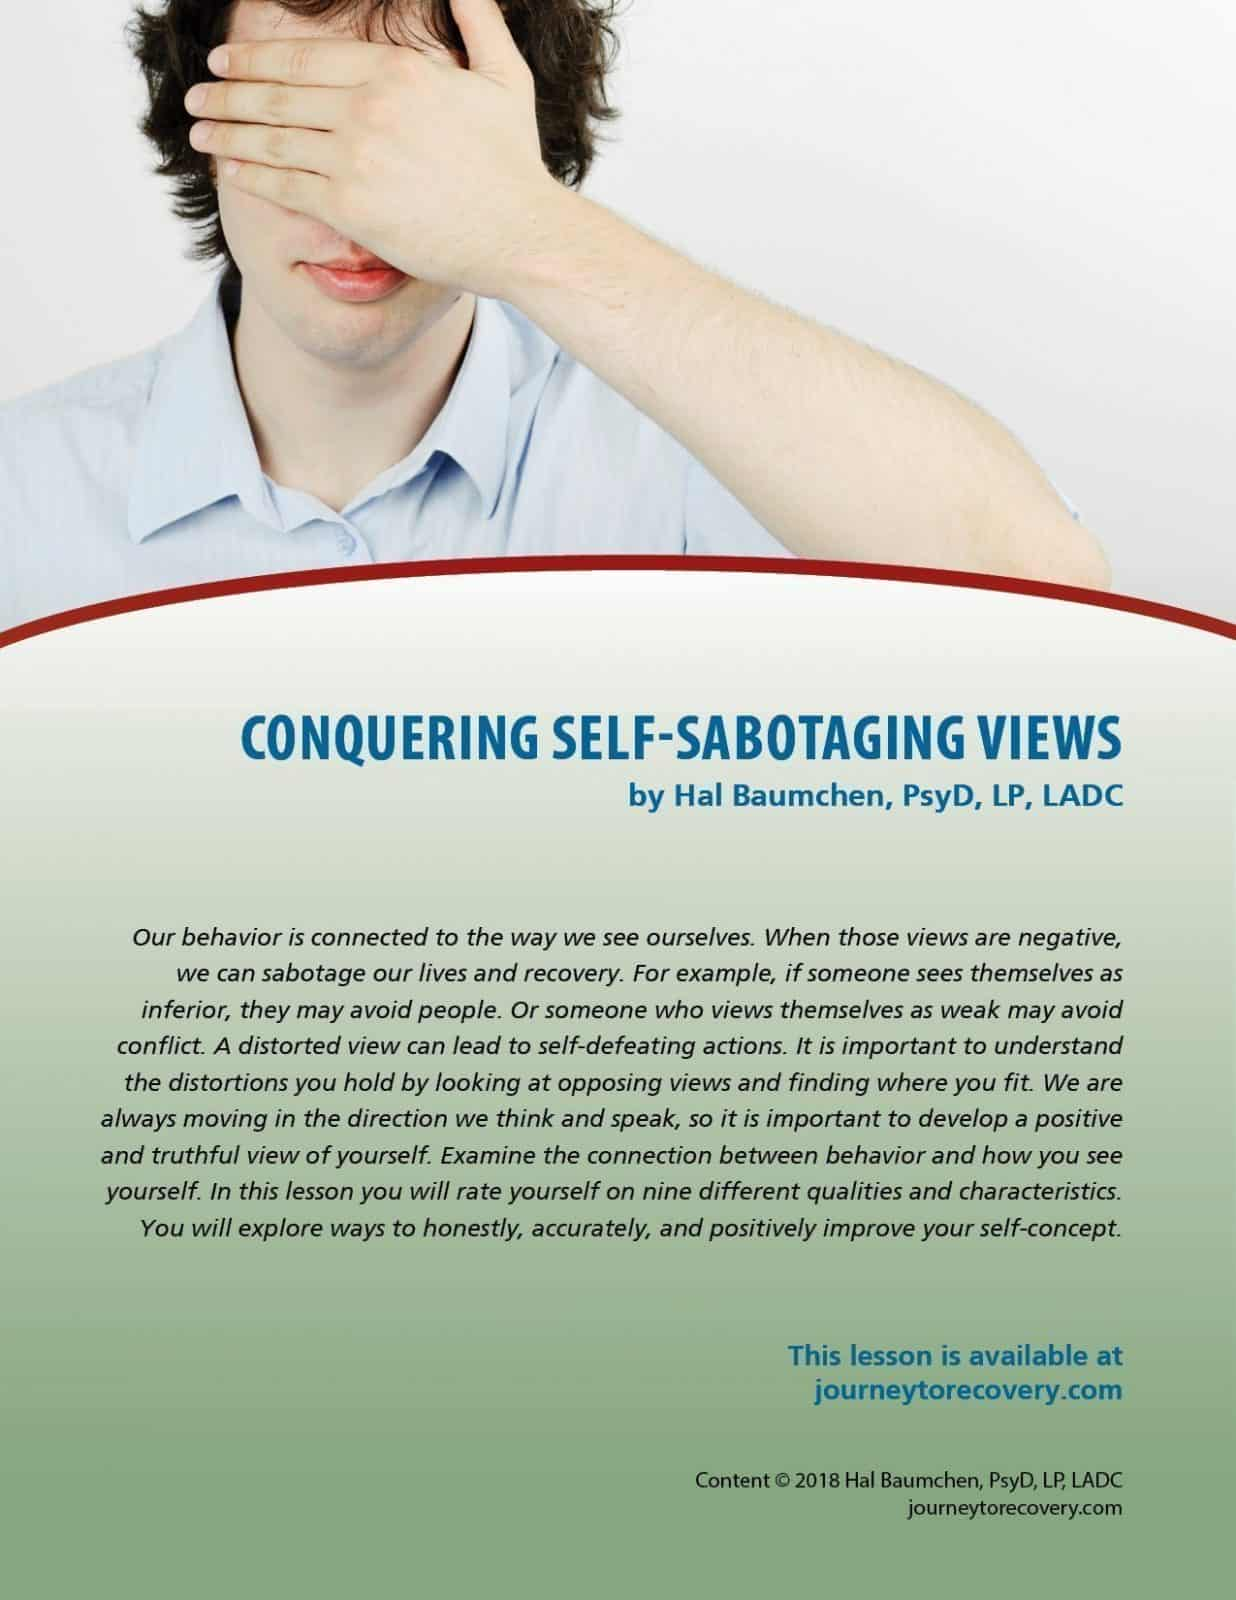 Conquering Self Sabotaging Views Cod Lesson